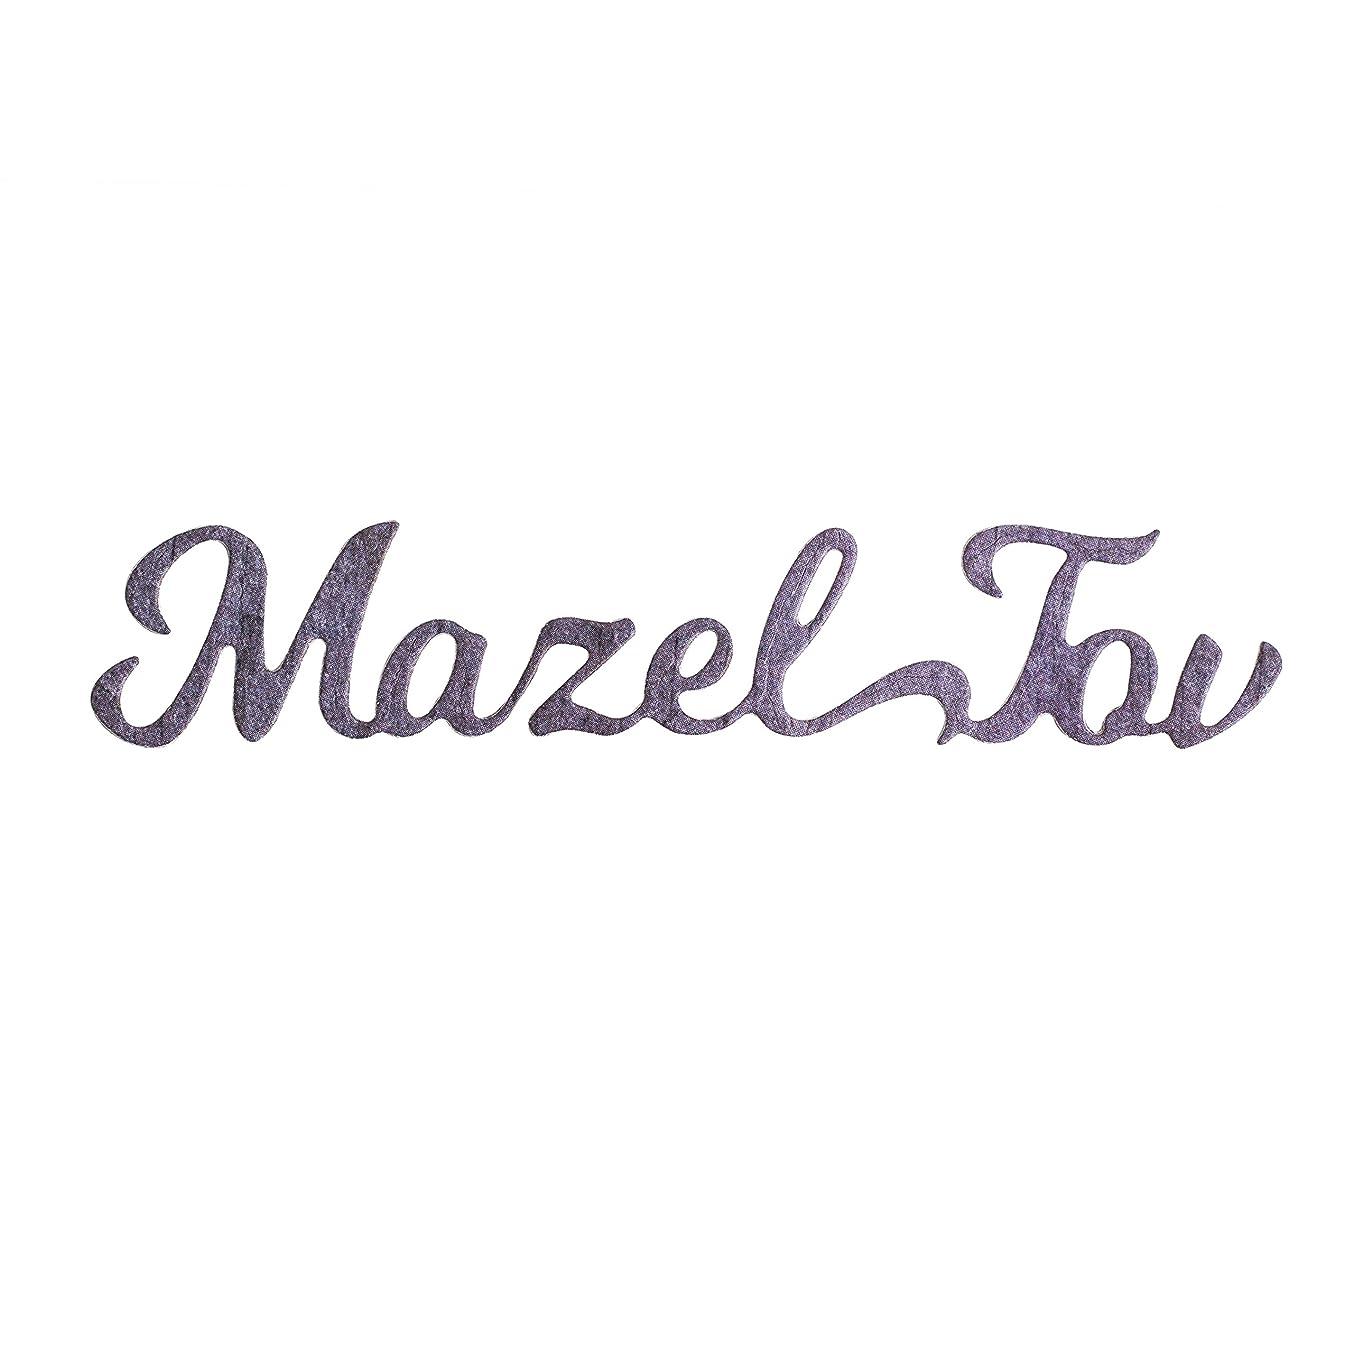 Mazel Tov Sentiment Die Cut - Hebrew Word Die - Metal Cutting Die for Card Making, Scrapbooking Supplies, Paper Crafting - Judaic Congrats Word Die by Matty's Crafting Joy